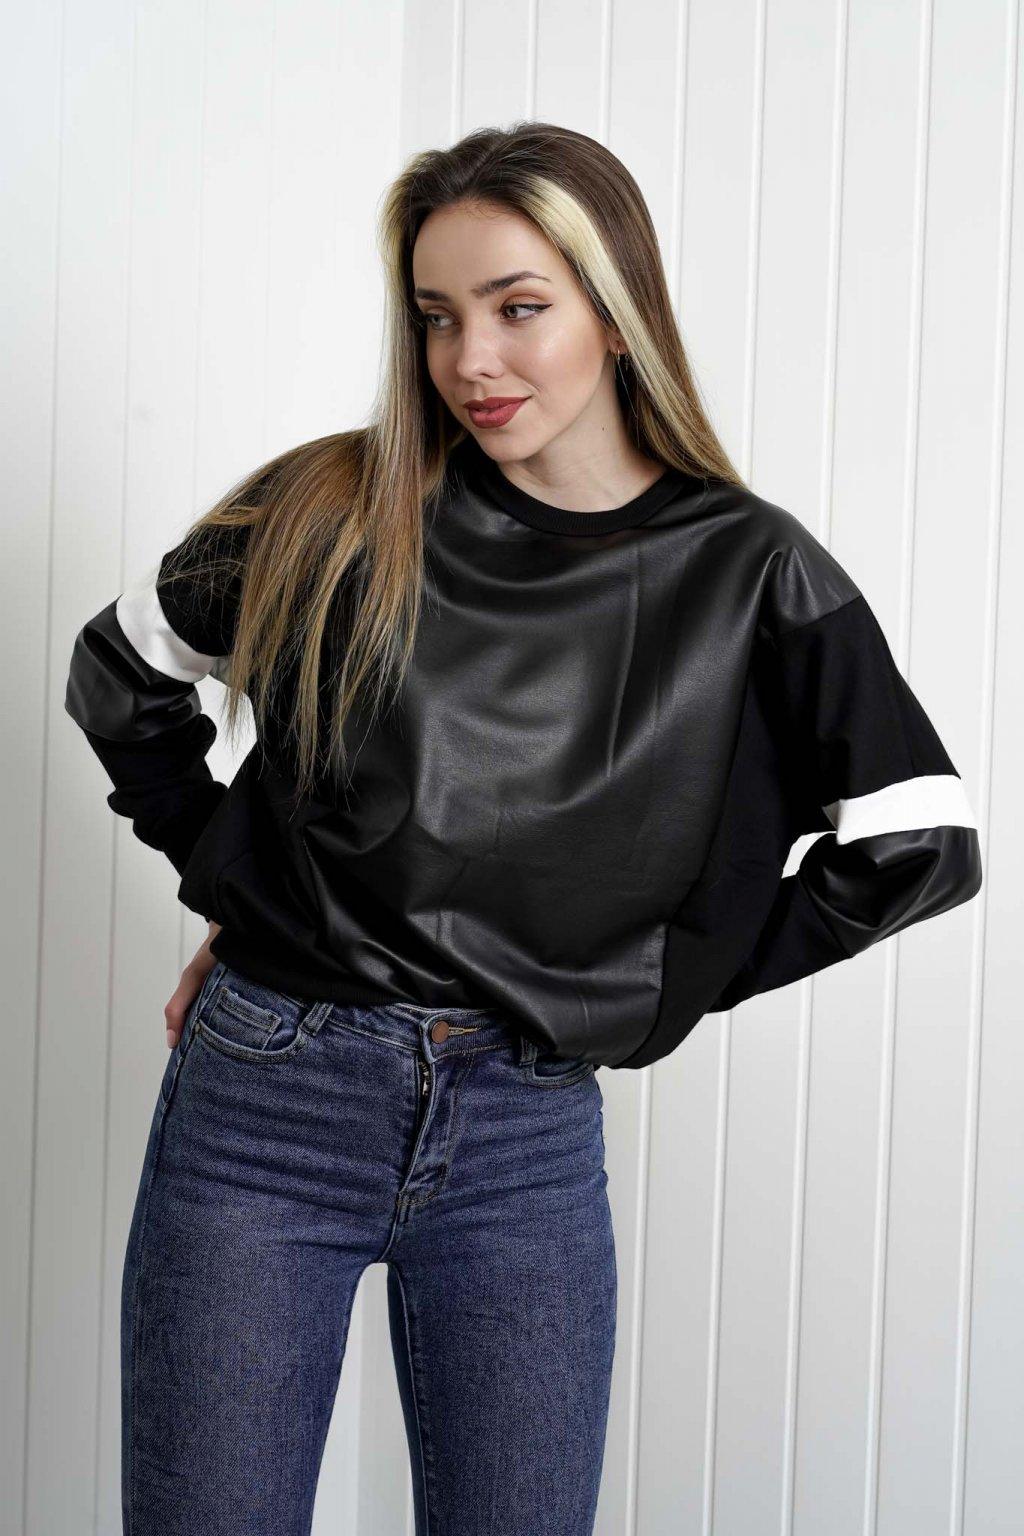 mikina, dámska, oversize, čierna, biela, farebná, športová, elegantná, štýlová, cribs oblečenie, dámske oblečenie, 176